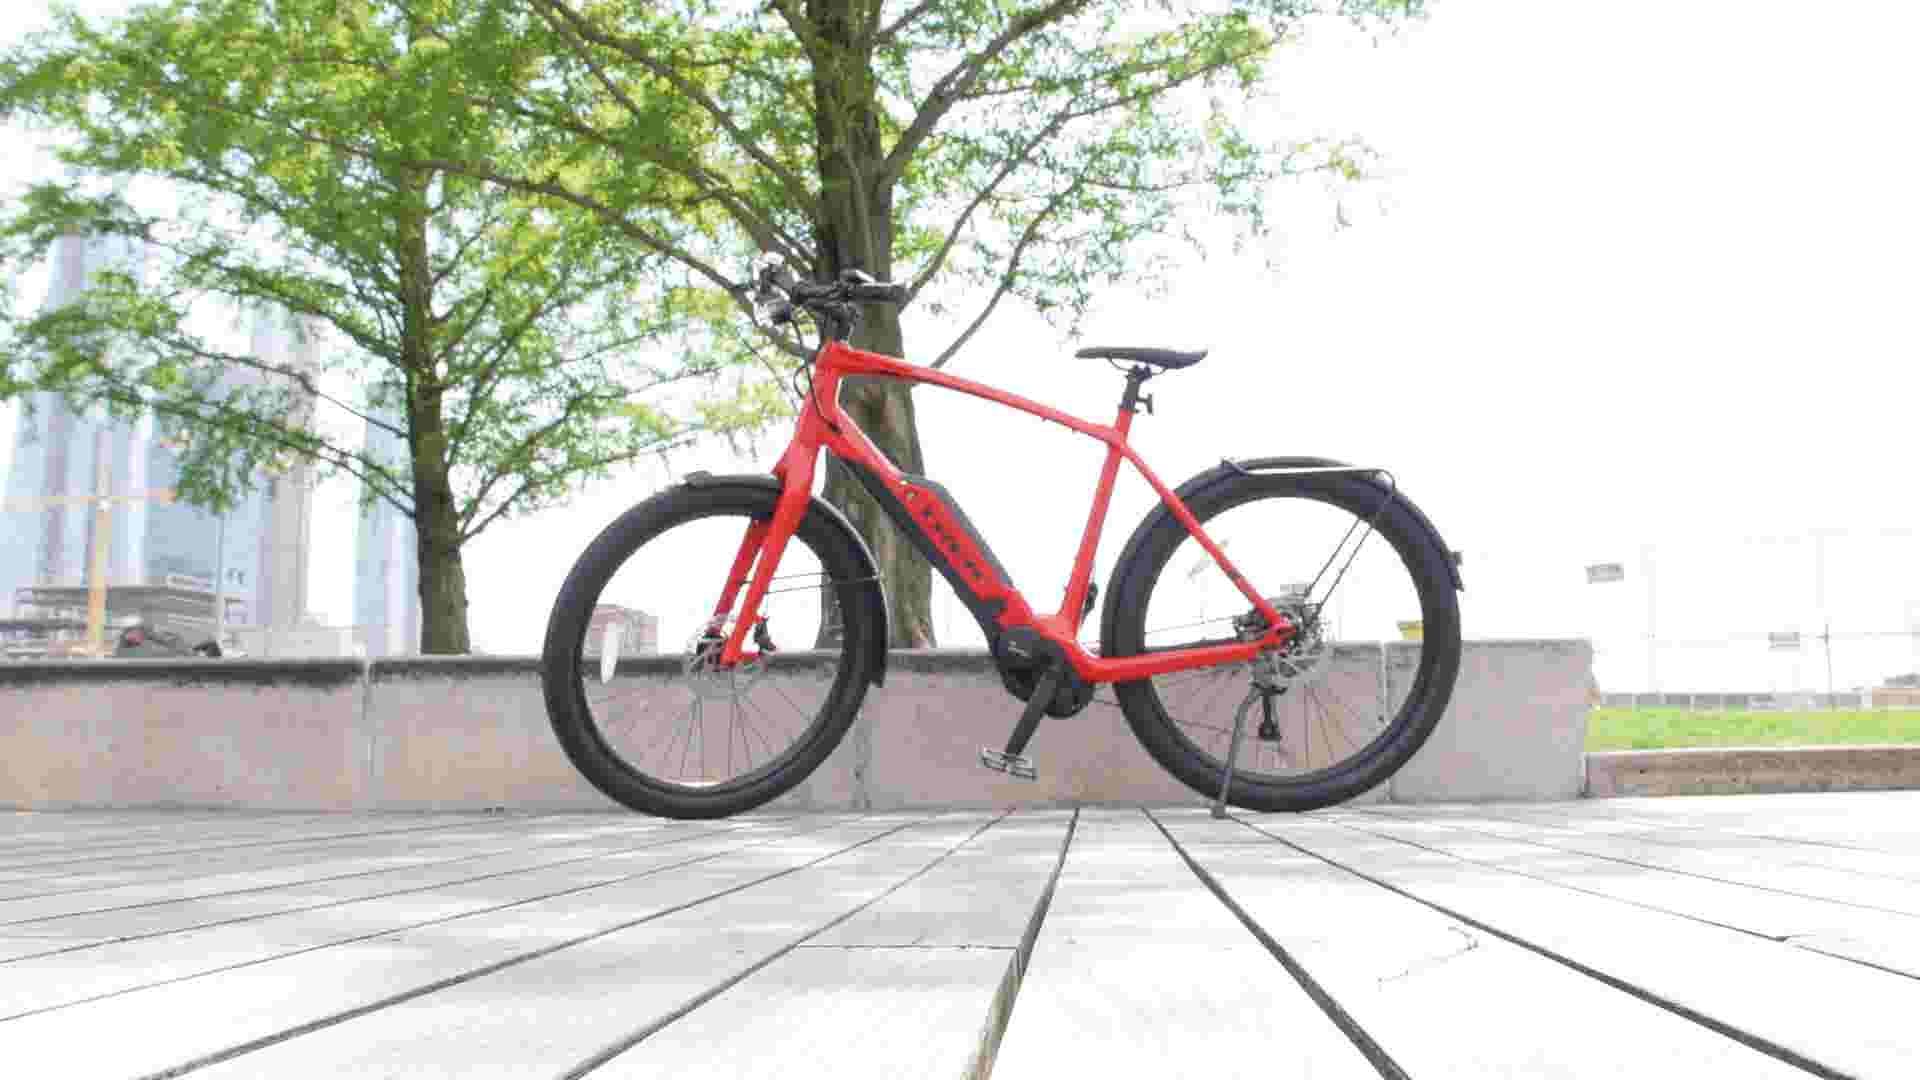 Electric Bikes Trek Bikes >> Trek S Ceo John Burke Talks E Bikes And The Benefits Of Cycling